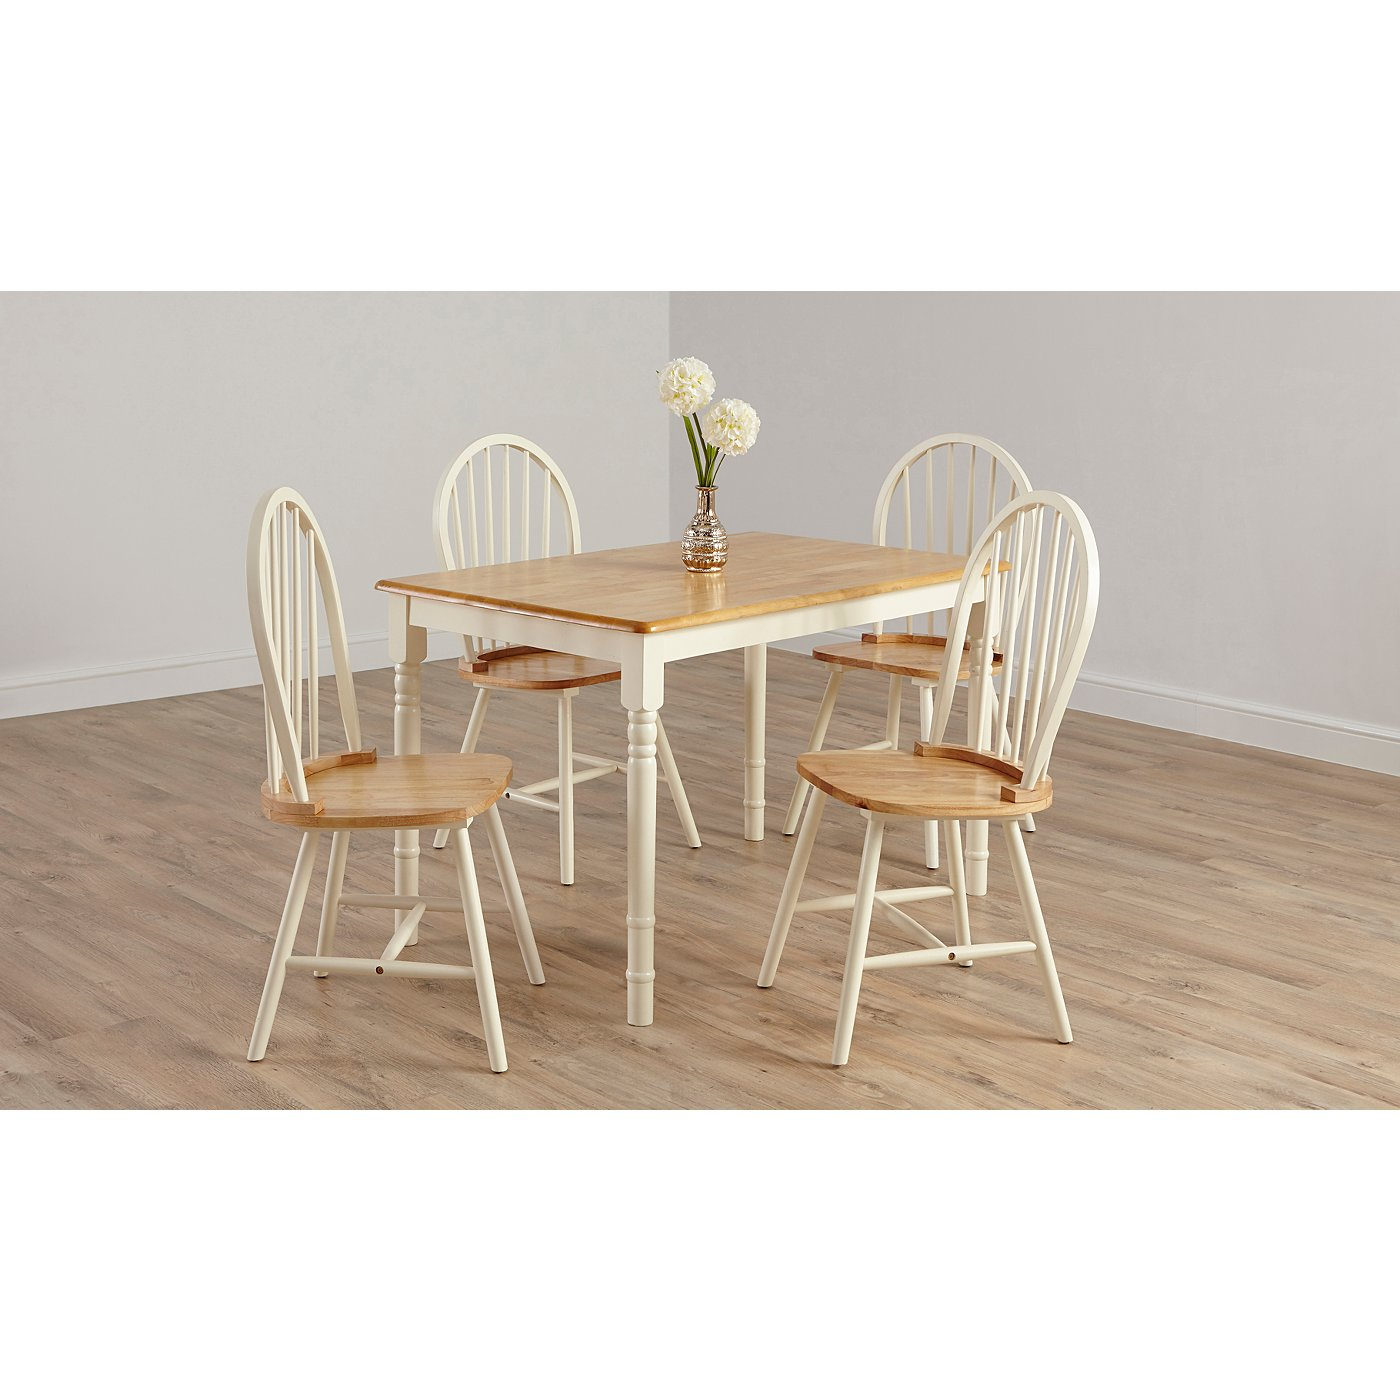 George Home Yvette Dining Furniture Range